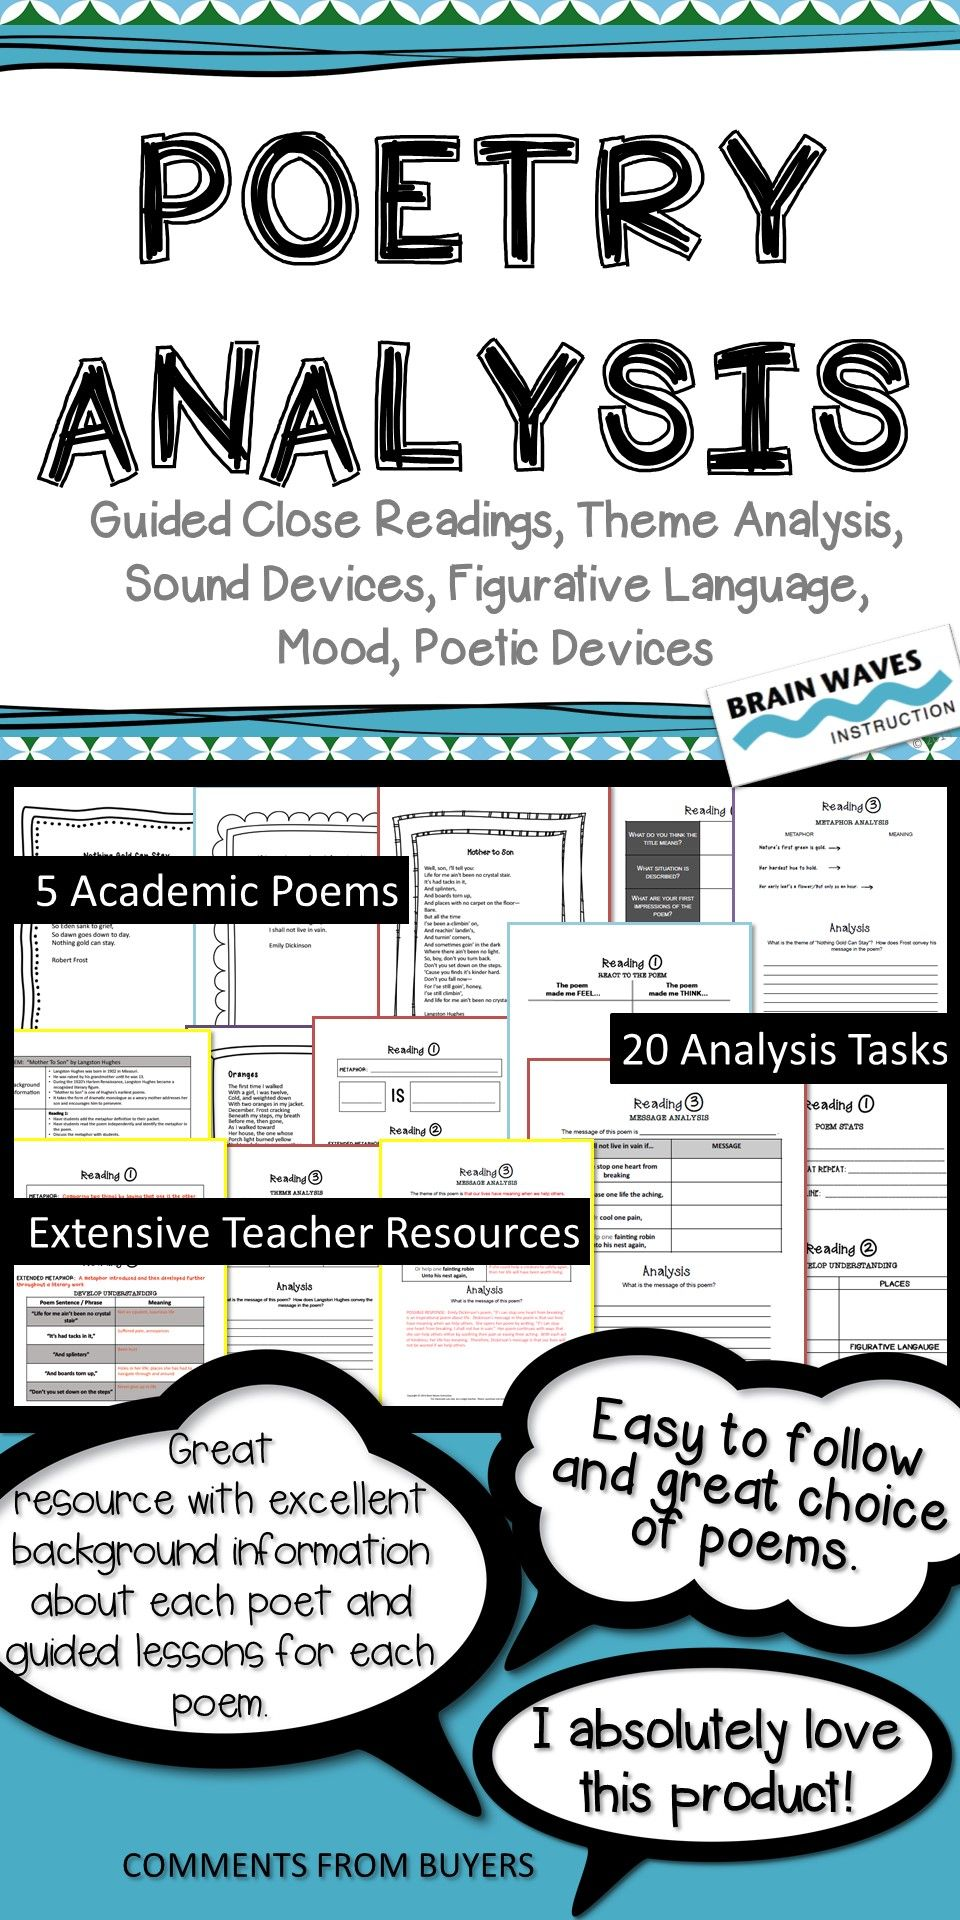 Poetry Analysis Unit 5 Poems 20 Analysis Tasks